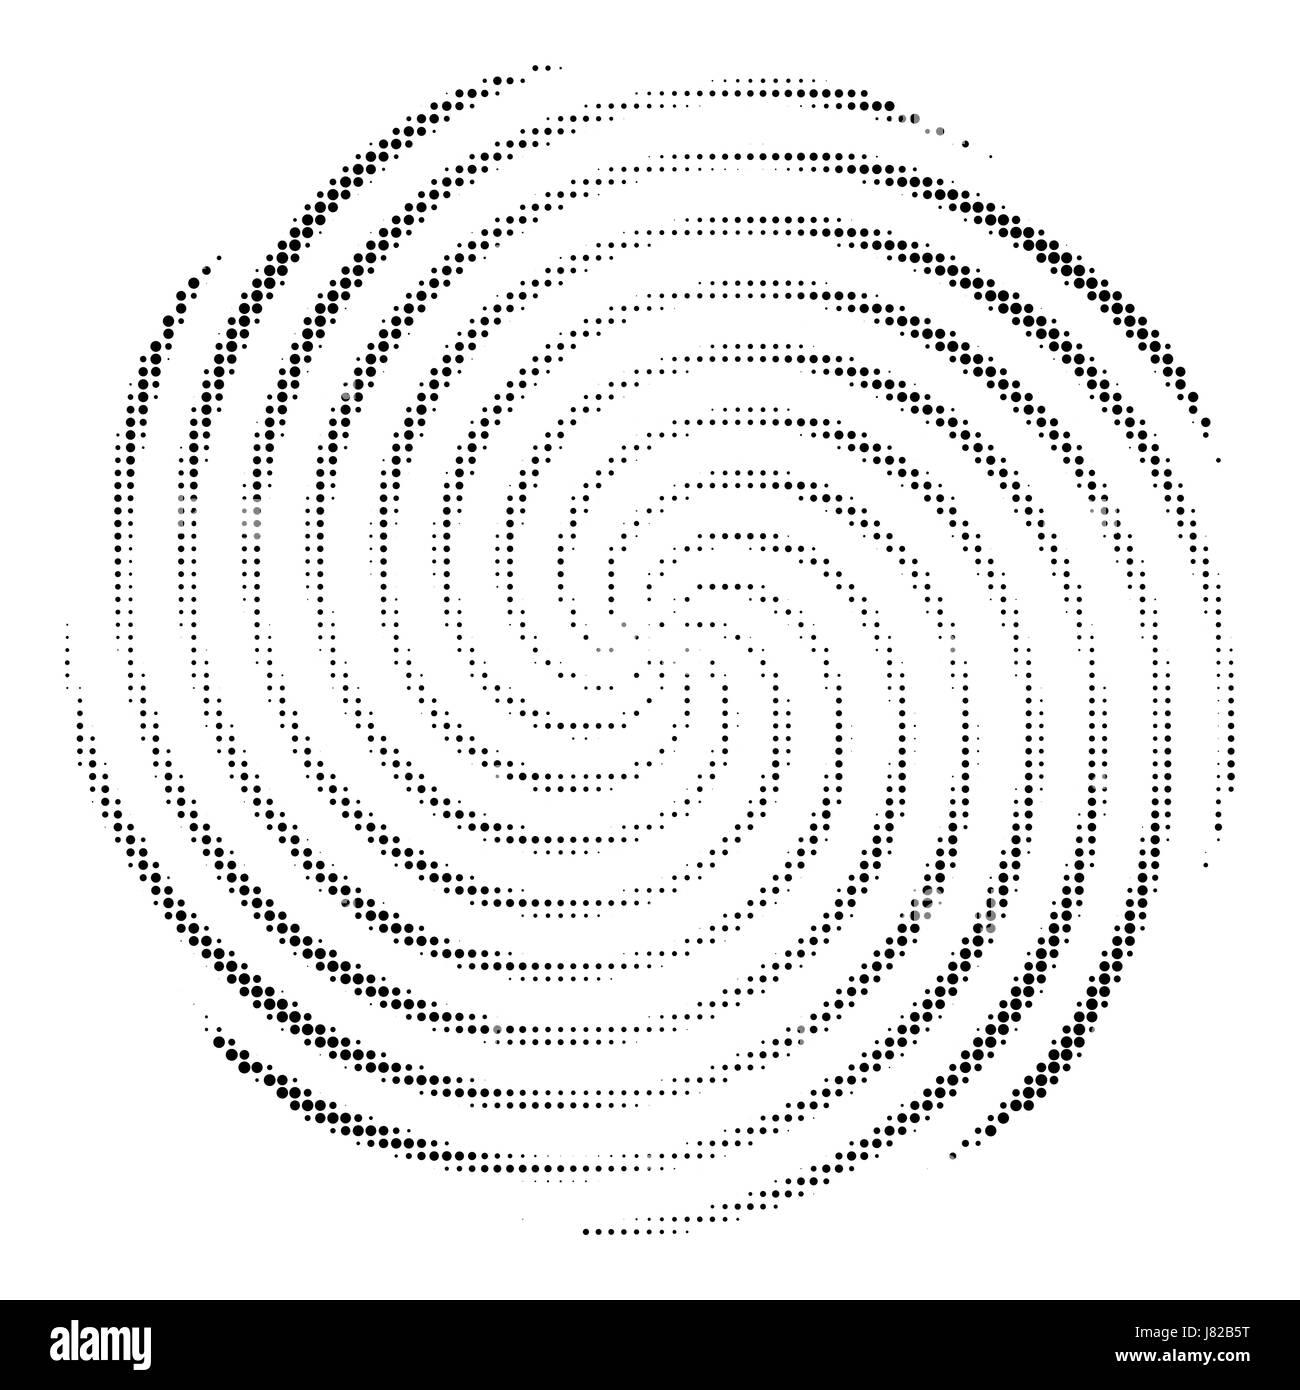 Abstract swirl halftone dot vector - Stock Image